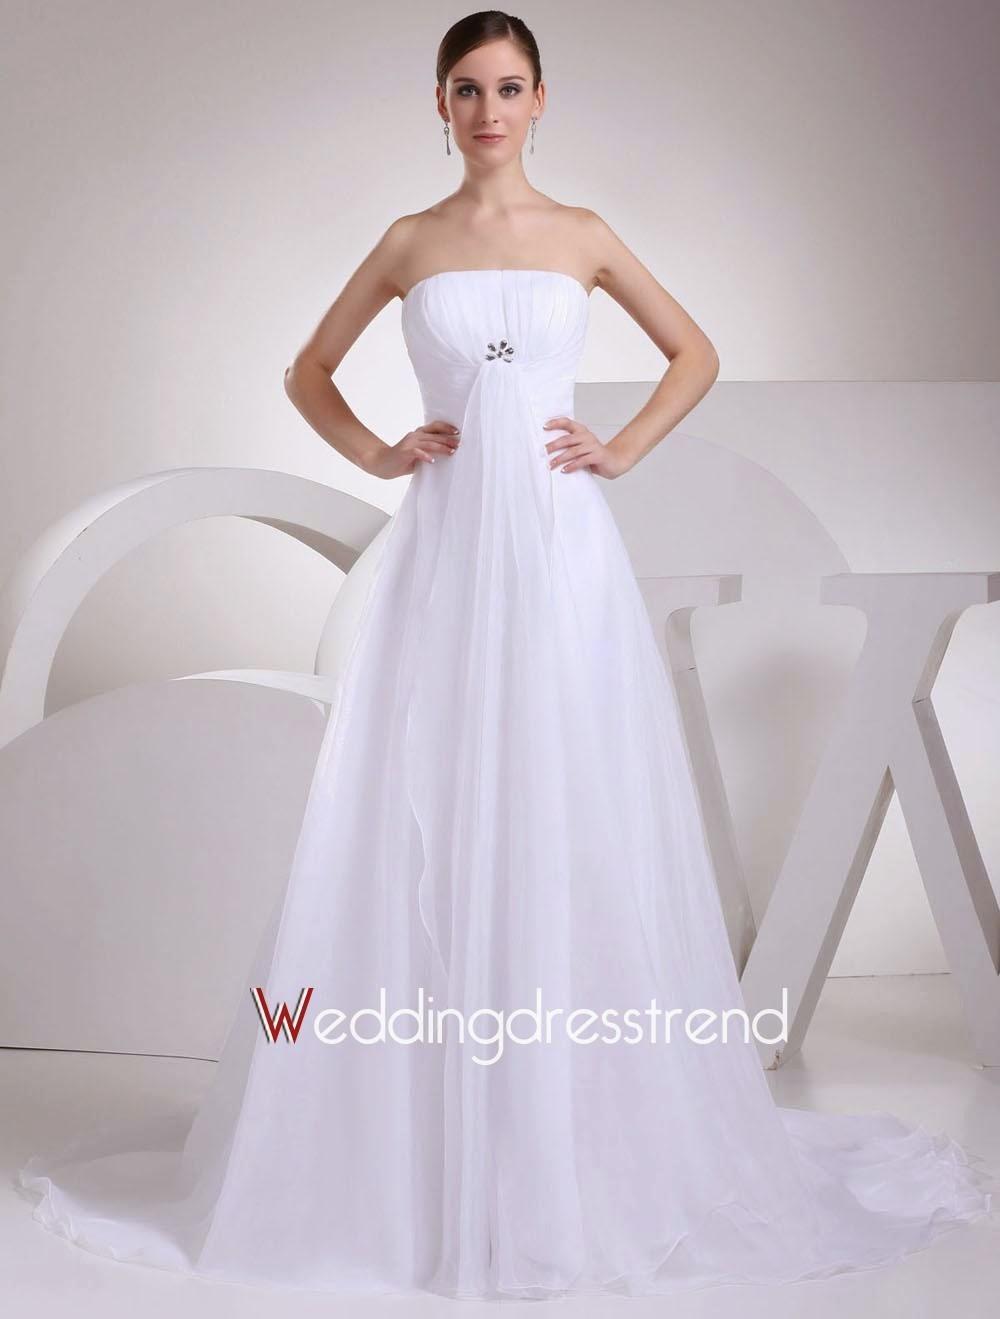 Vestidos de novia Embarazo